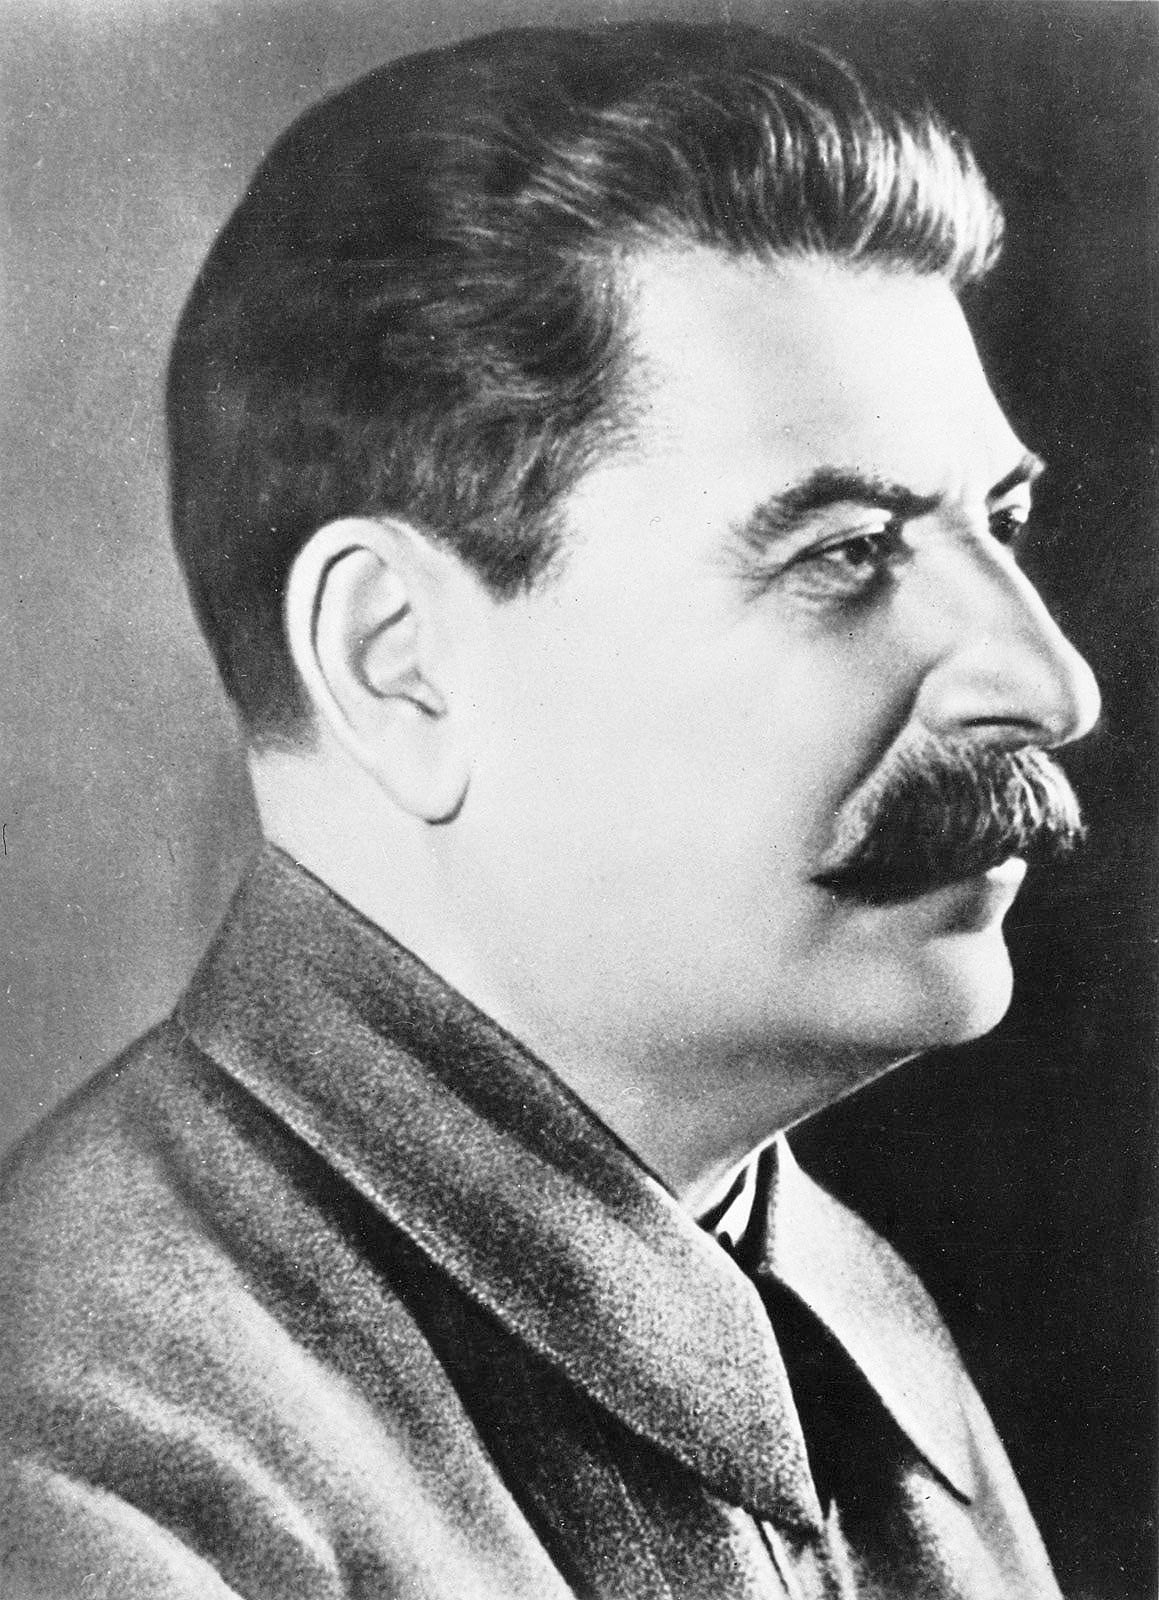 Biografiya-Iosif-Stalin-2